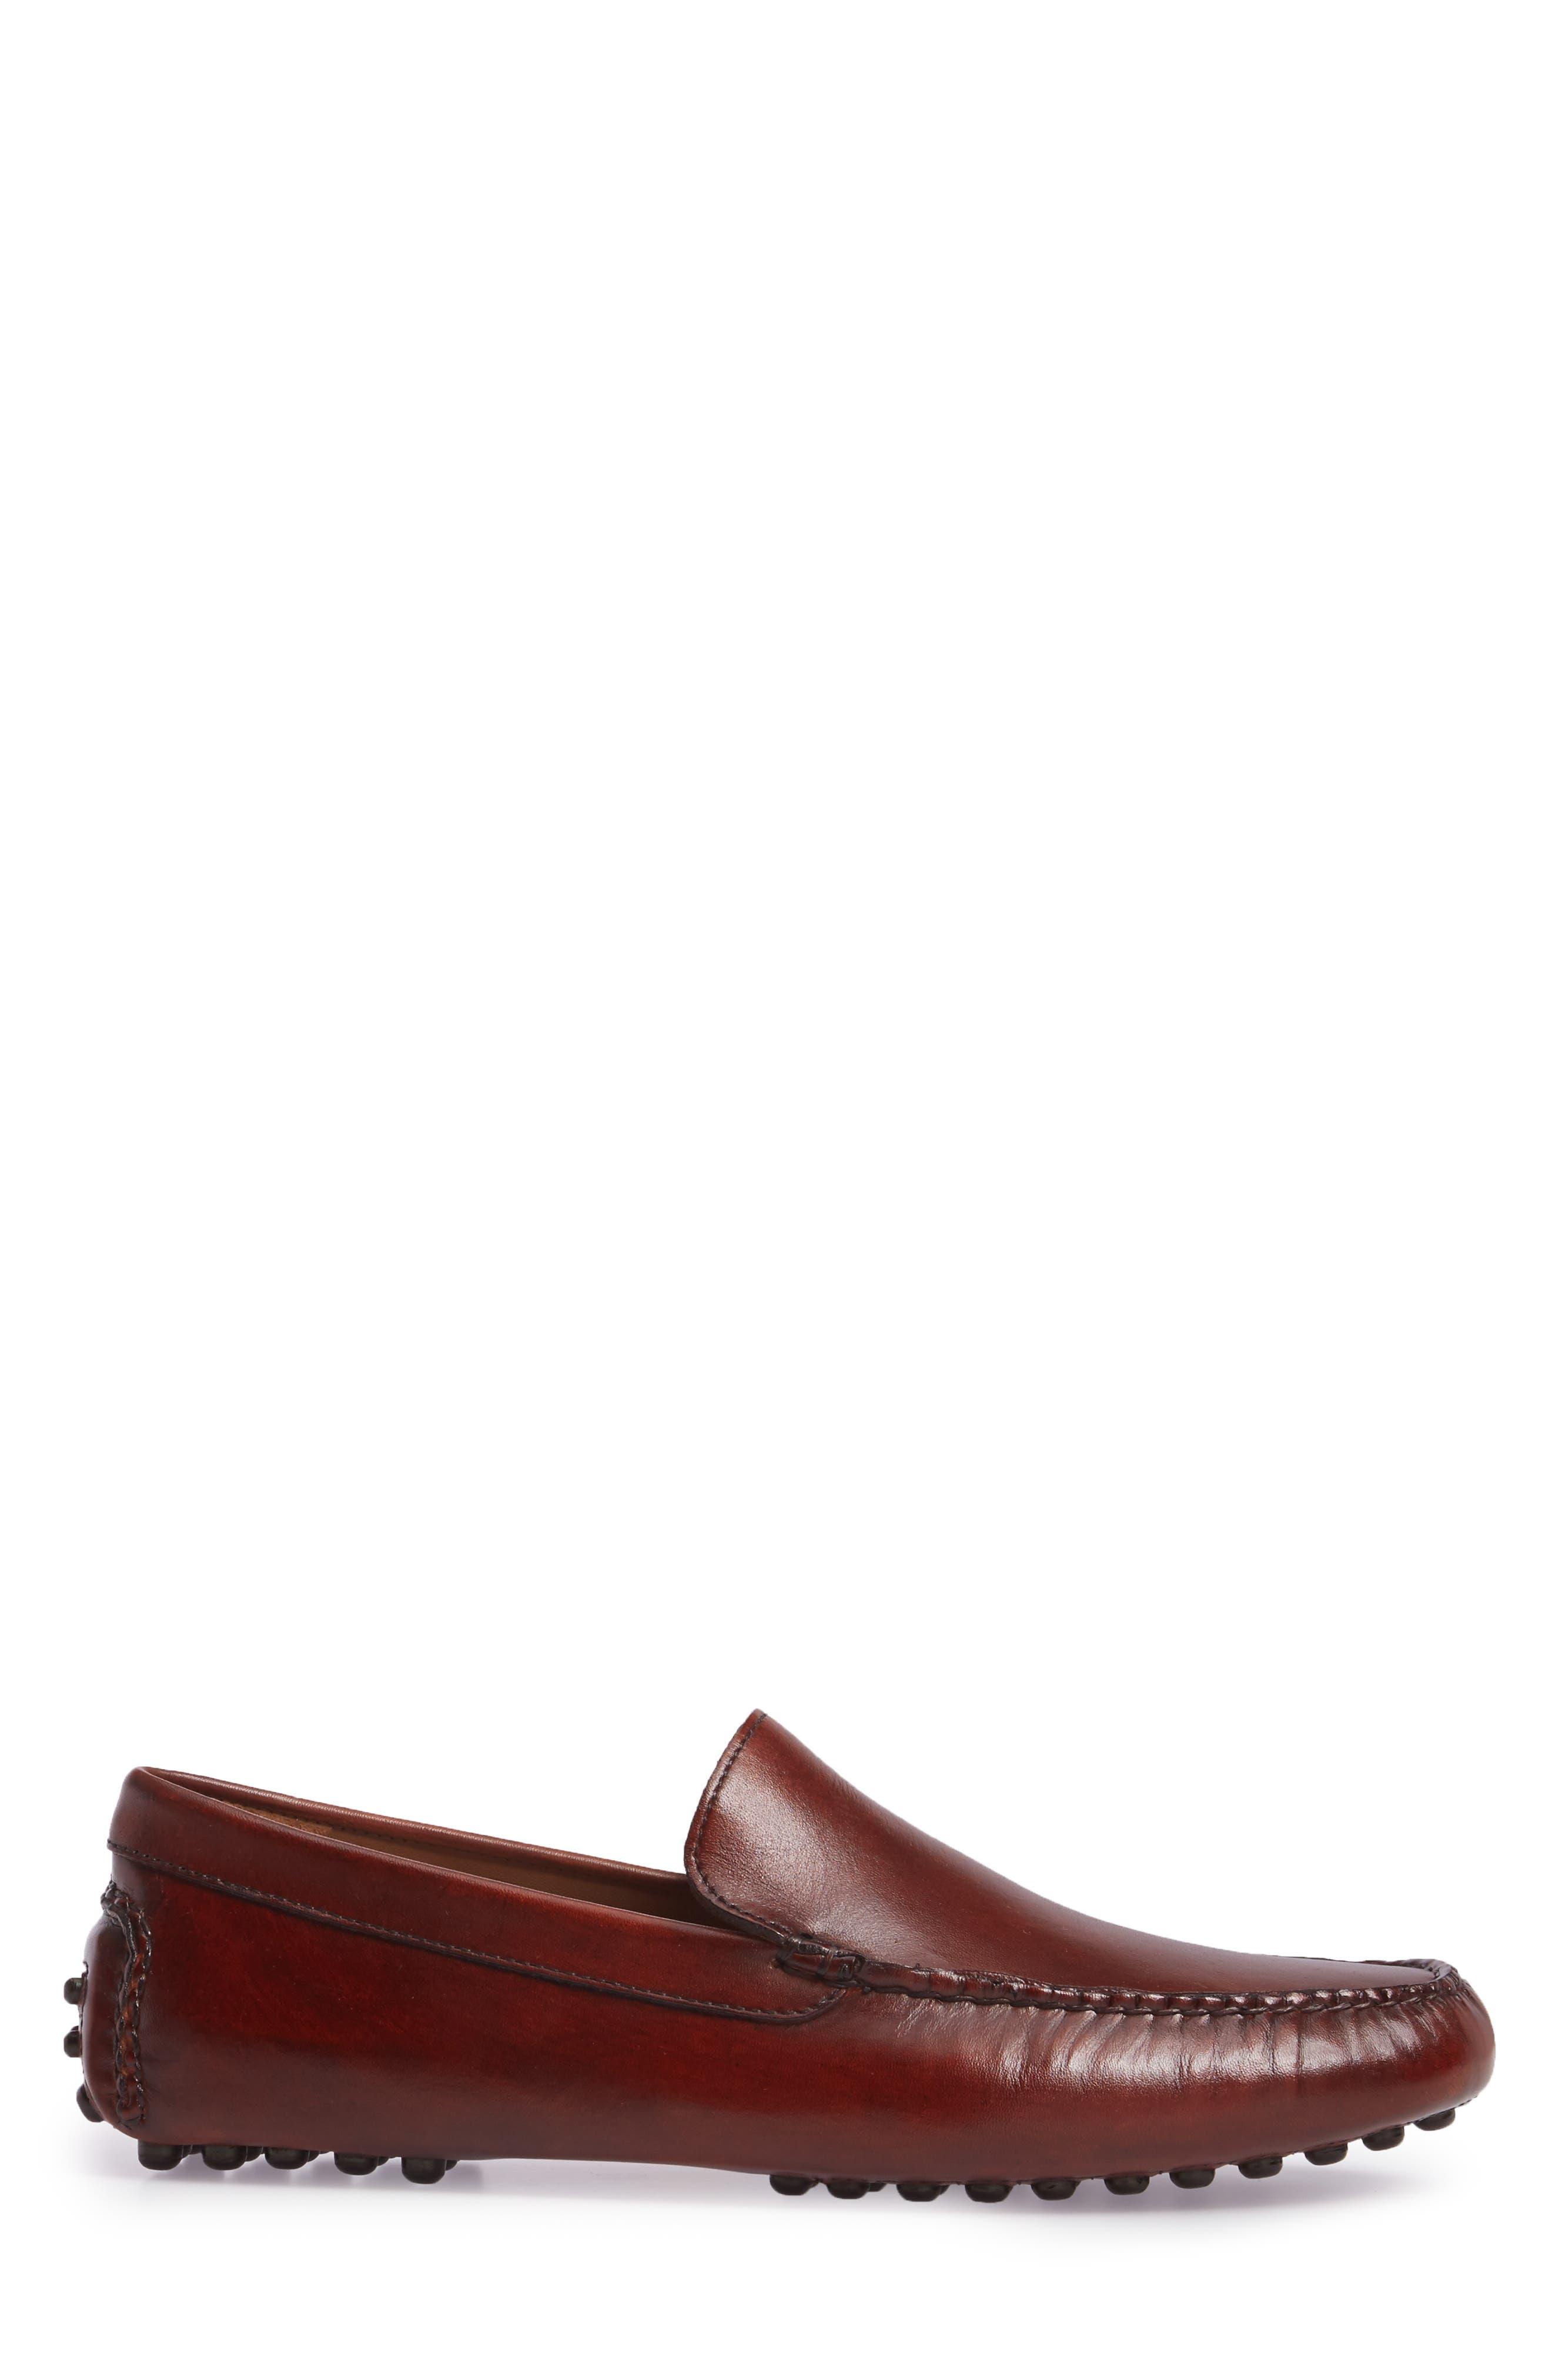 Alternate Image 3  - John W. Nordstrom® Cane Driving Shoe (Men)